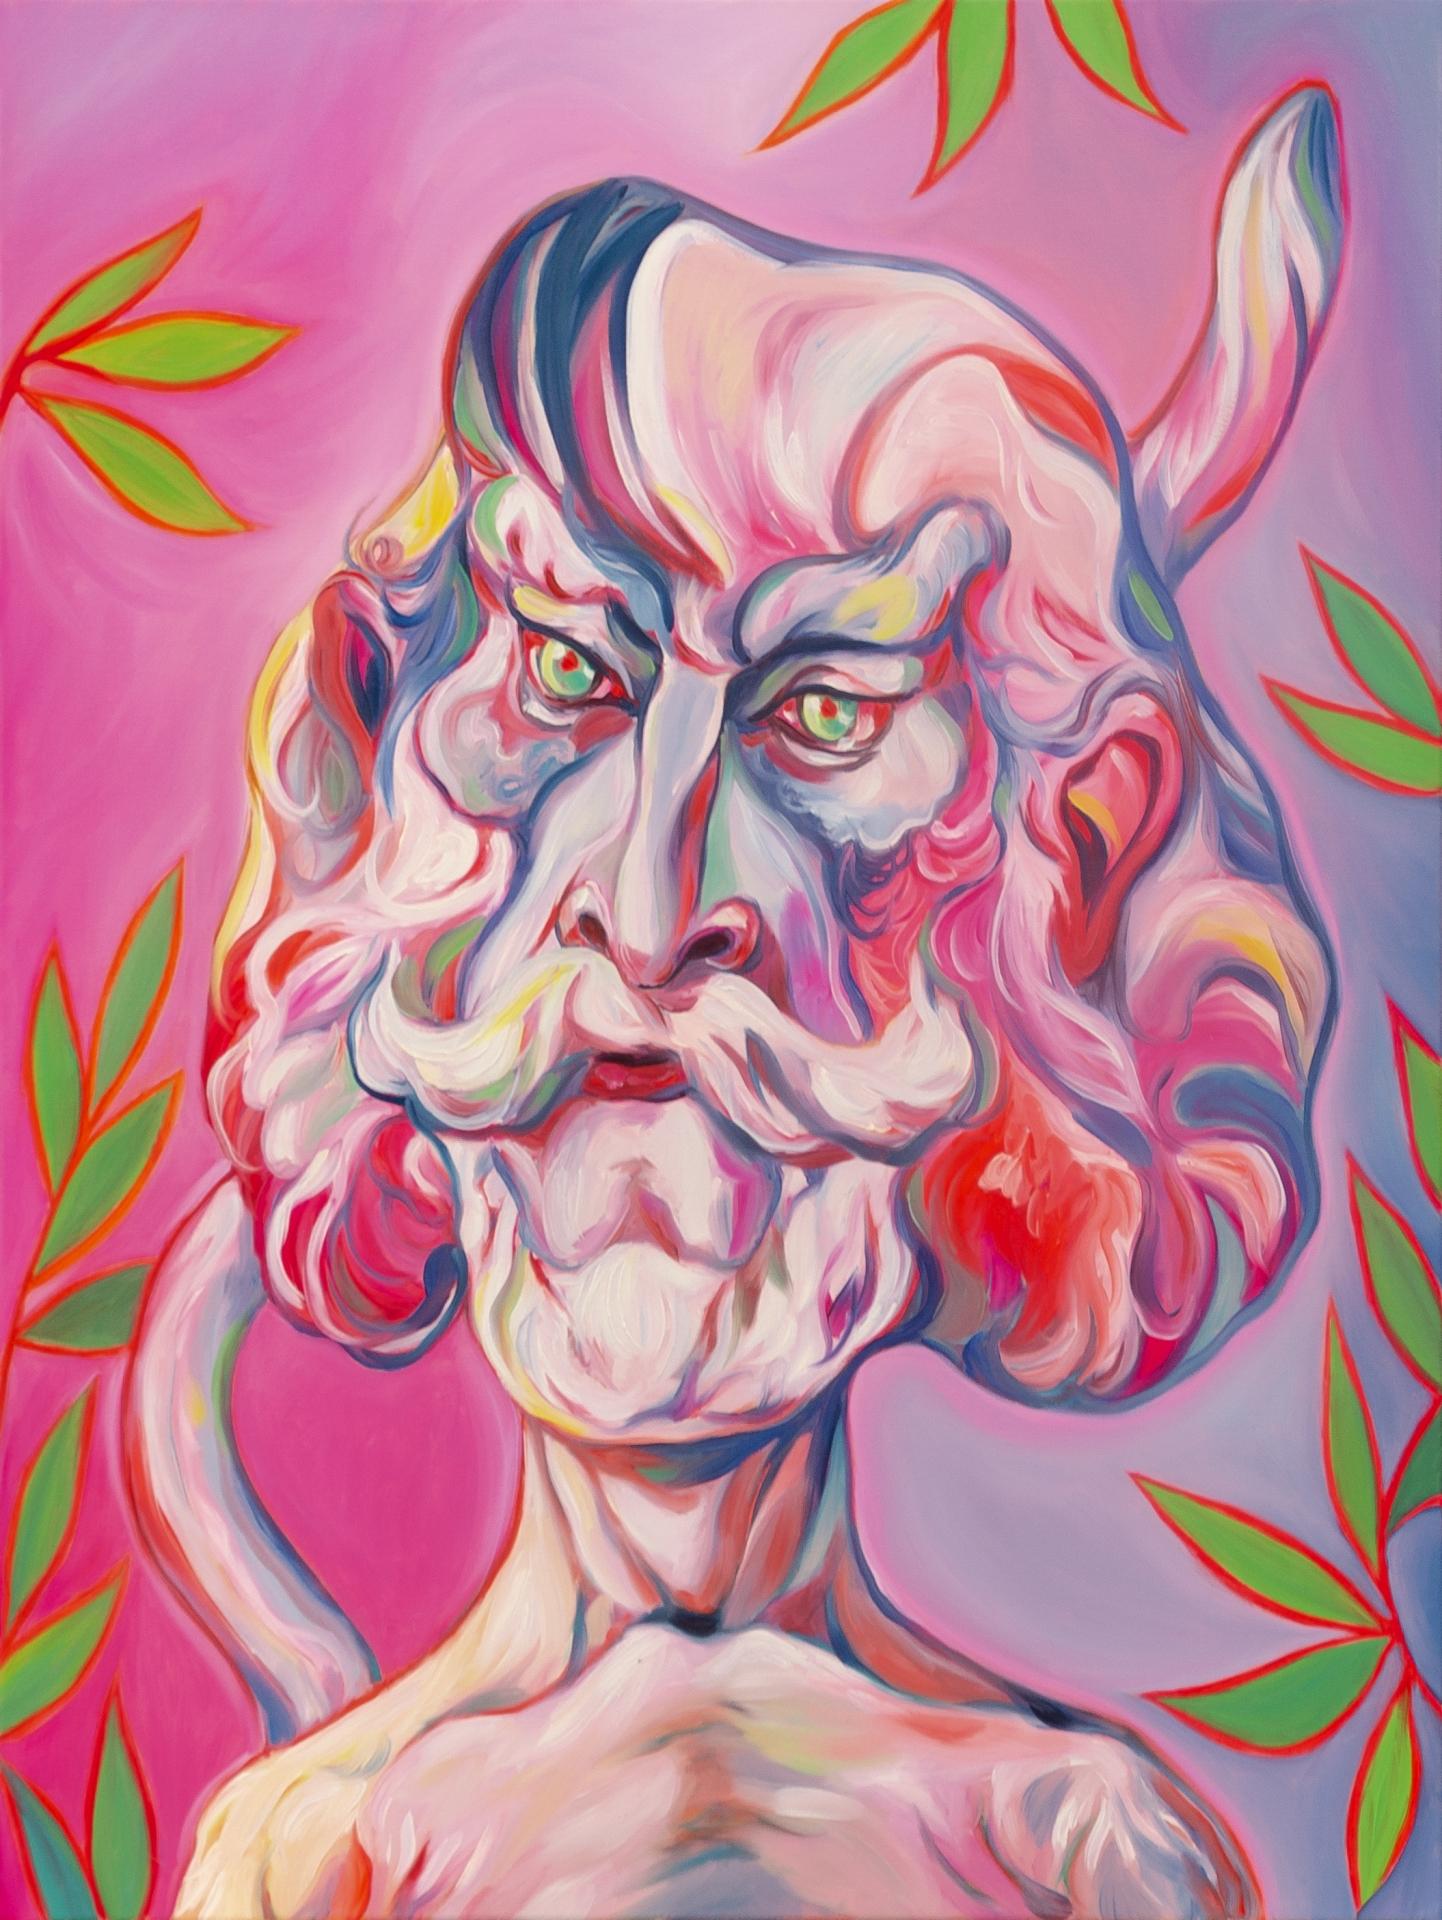 Luigi Presicce - Homo Sapiens Sapiens Sapiens (Stefano) - 2020 - Olio su tela - 80x60cm - fot_n_ 2392 - Cod_11Pre2020